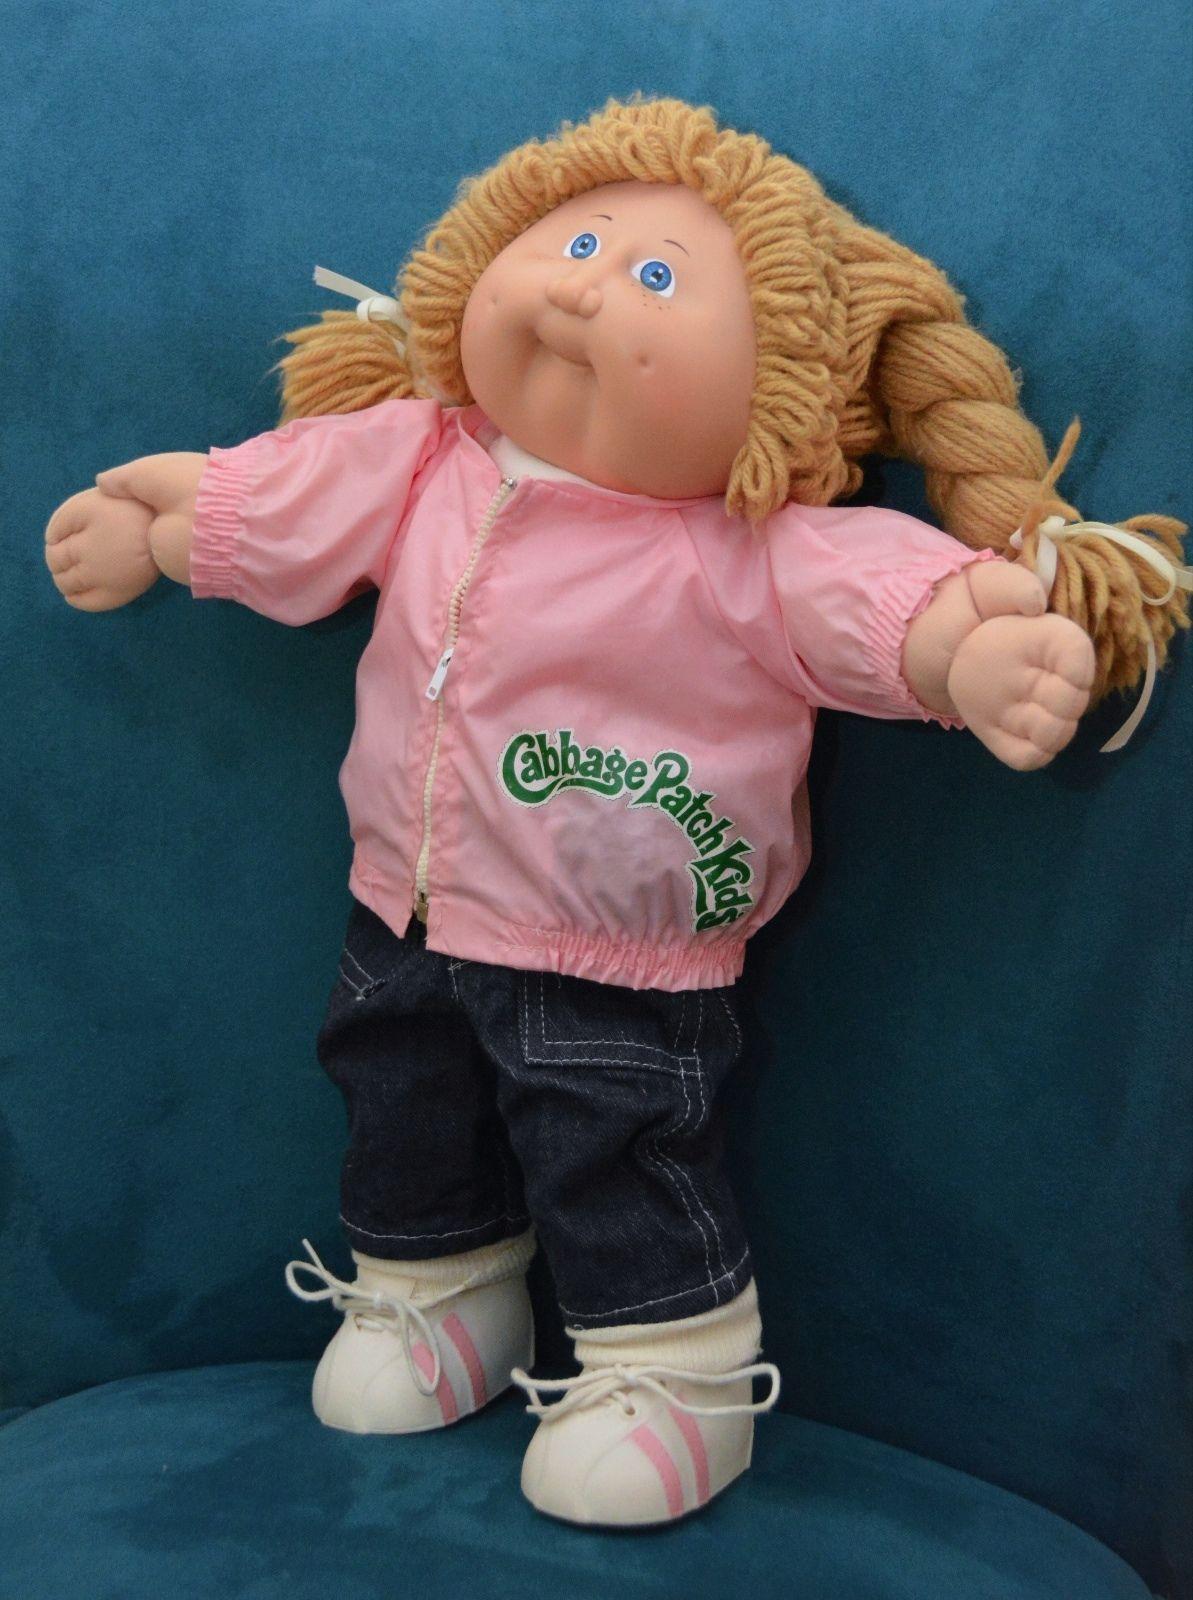 Vintage 83 Cabbage Patch Kid Girl W Sandy Blonde Braids Blue Eyes Freckles Cabbage Patch Kids Cabbage Patch Babies Cabbage Patch Dolls